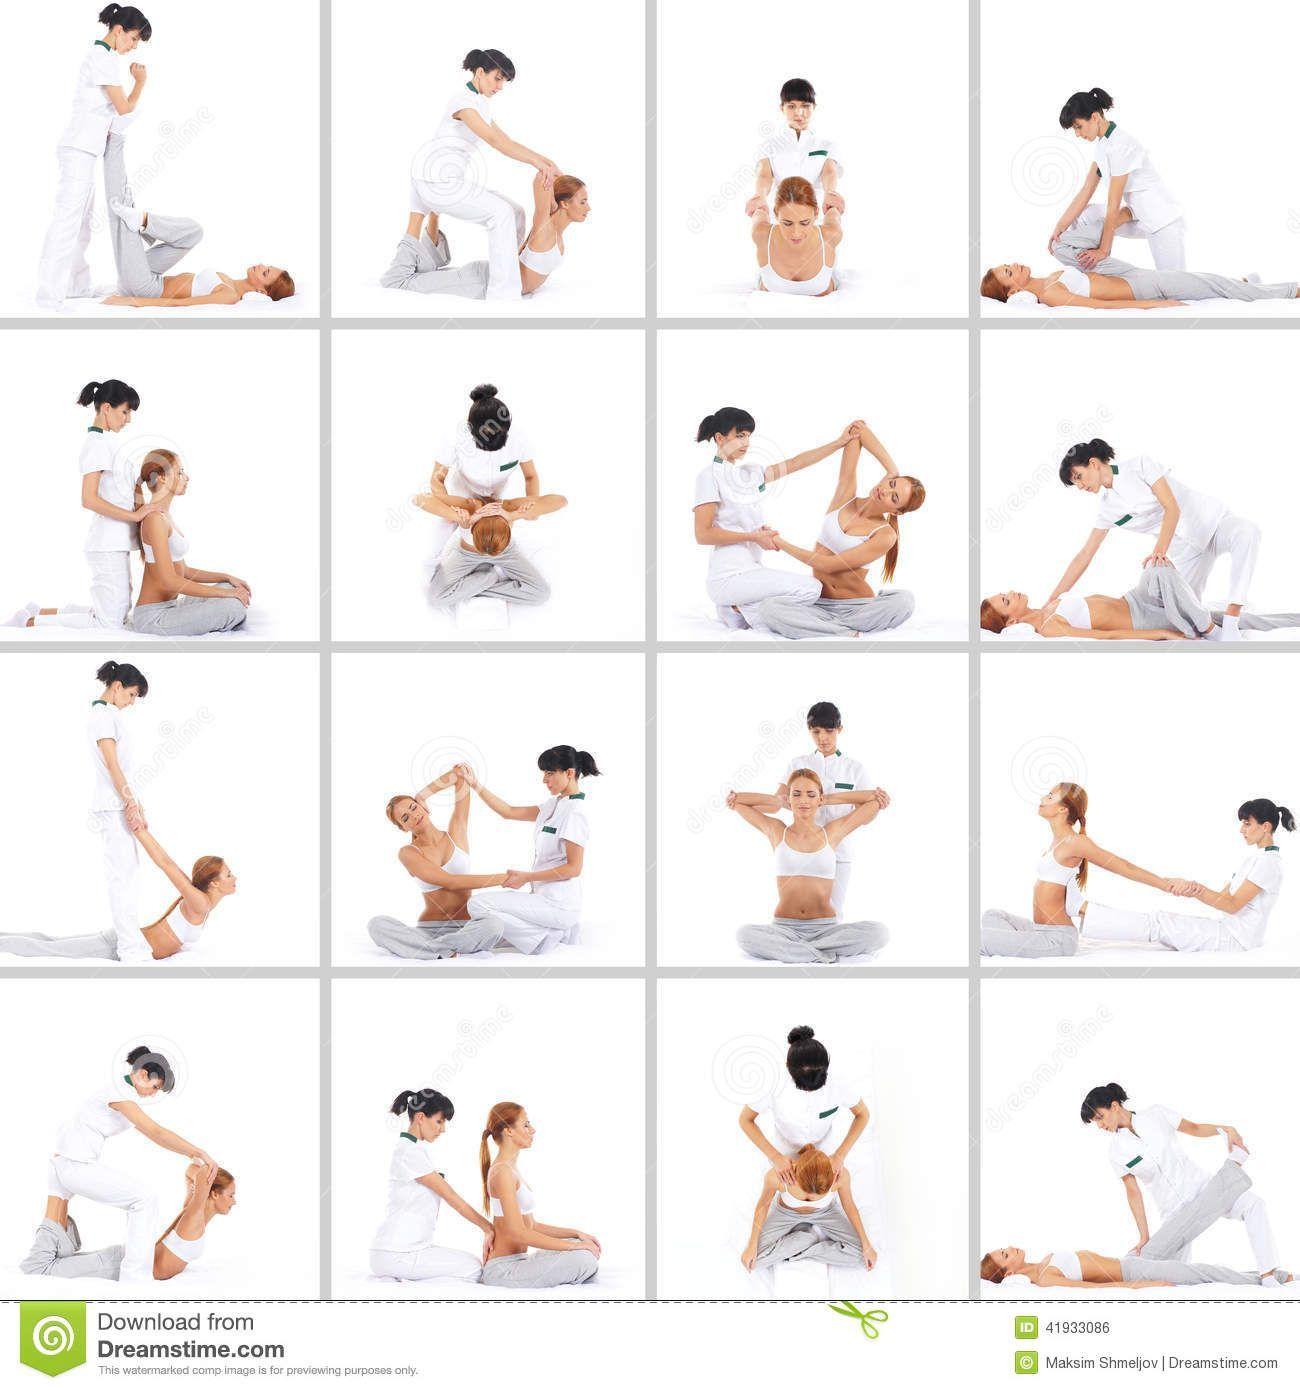 yoga massage - Google Search in 2020   Thai yoga massage